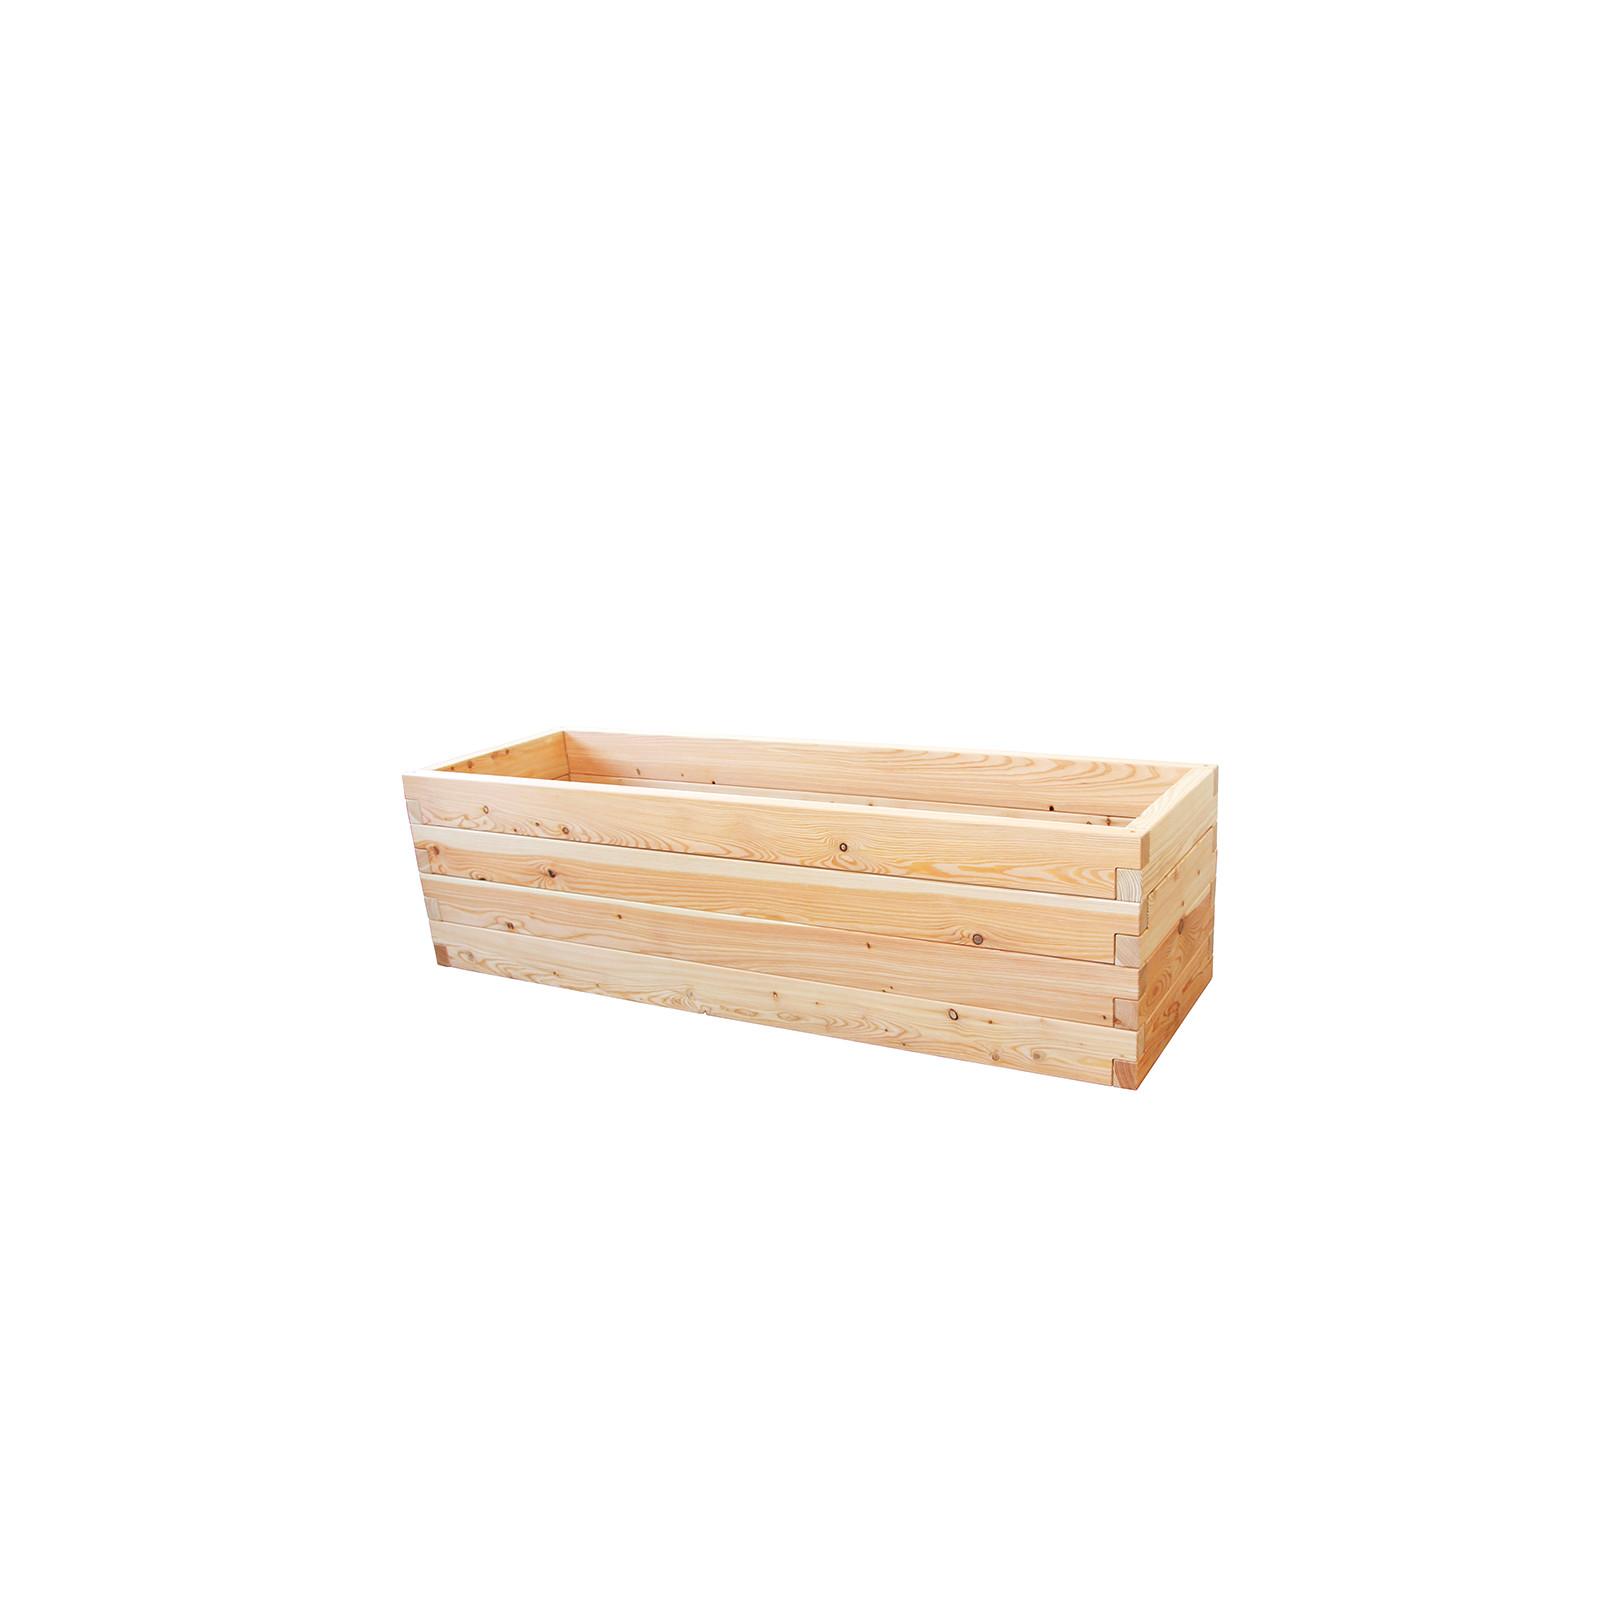 Hochbeete Aus Holz Bei Gartenallerlei